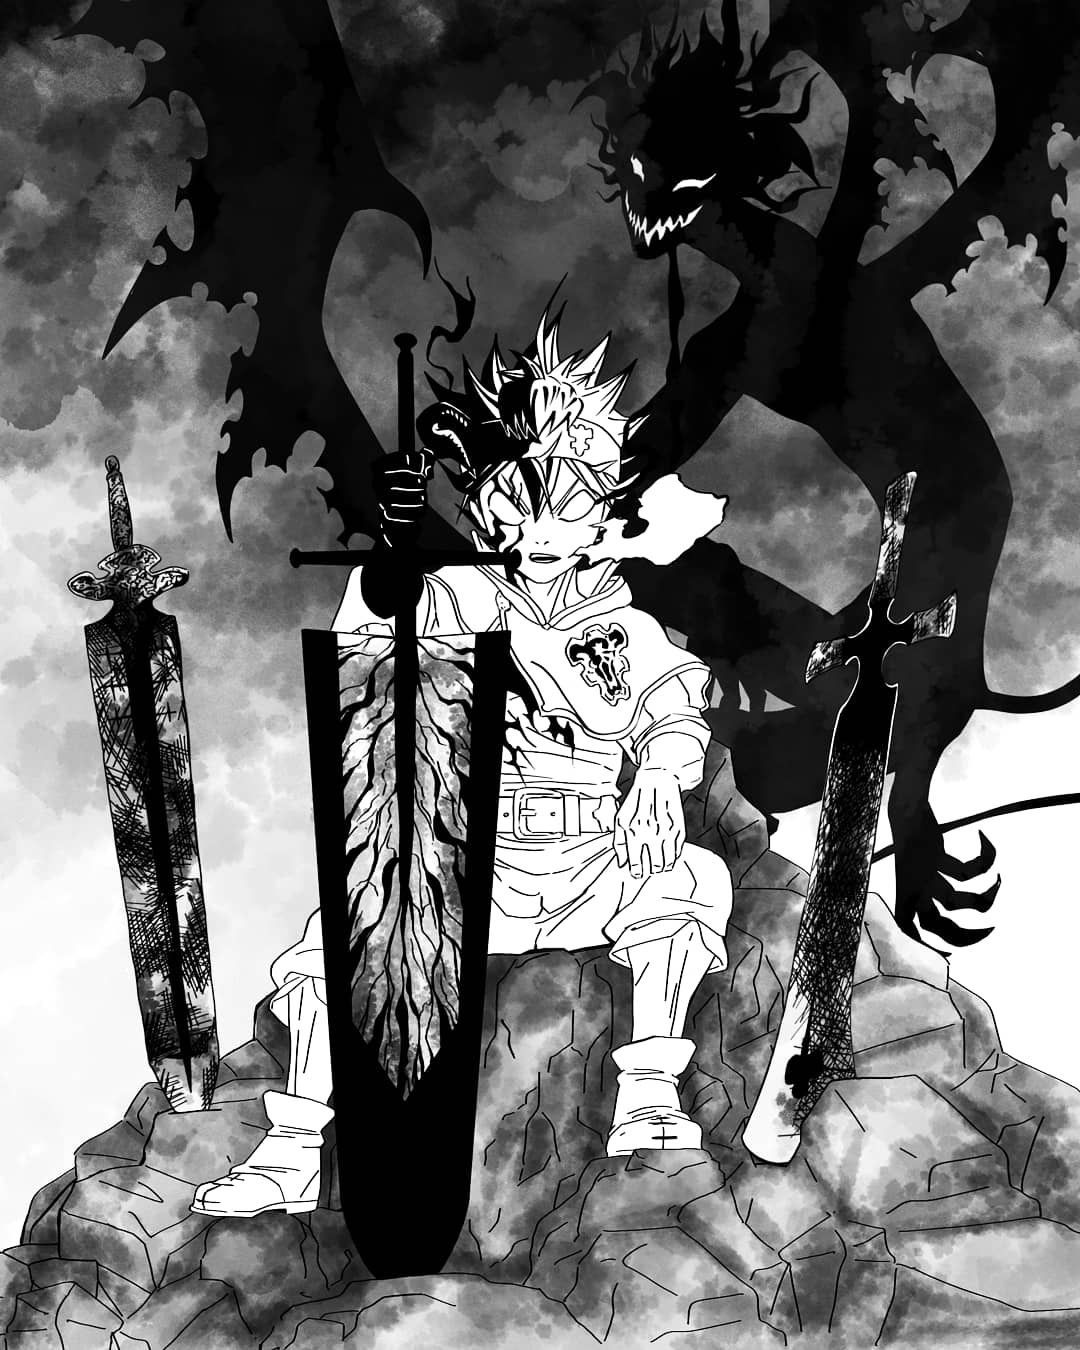 Black Clover Manga Wallpapers Top Free Black Clover Manga Backgrounds Wallpaperaccess